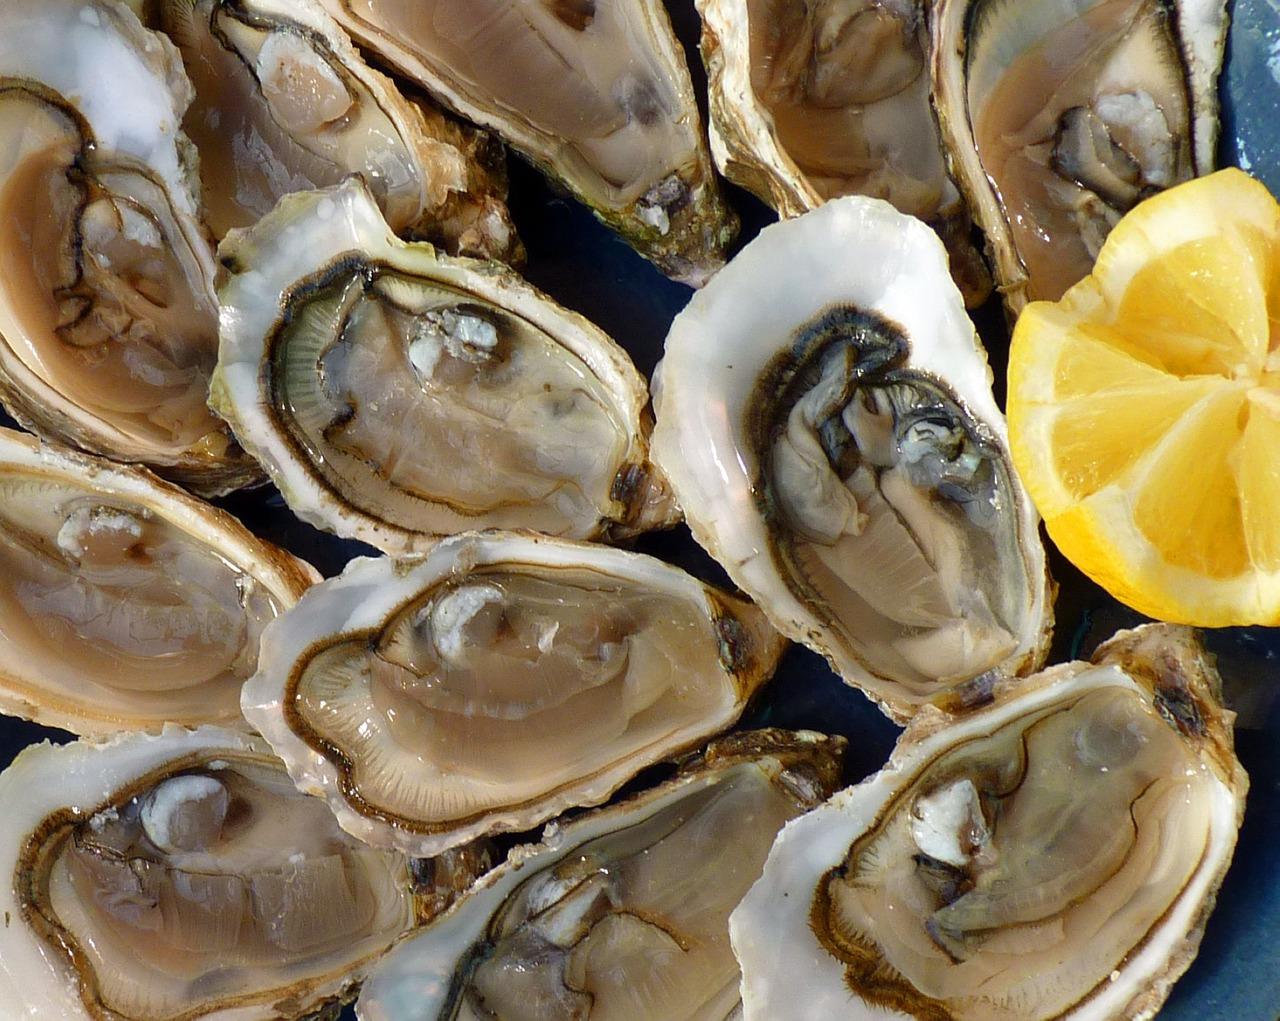 Un plato de ostras crudas. / PIXABAY